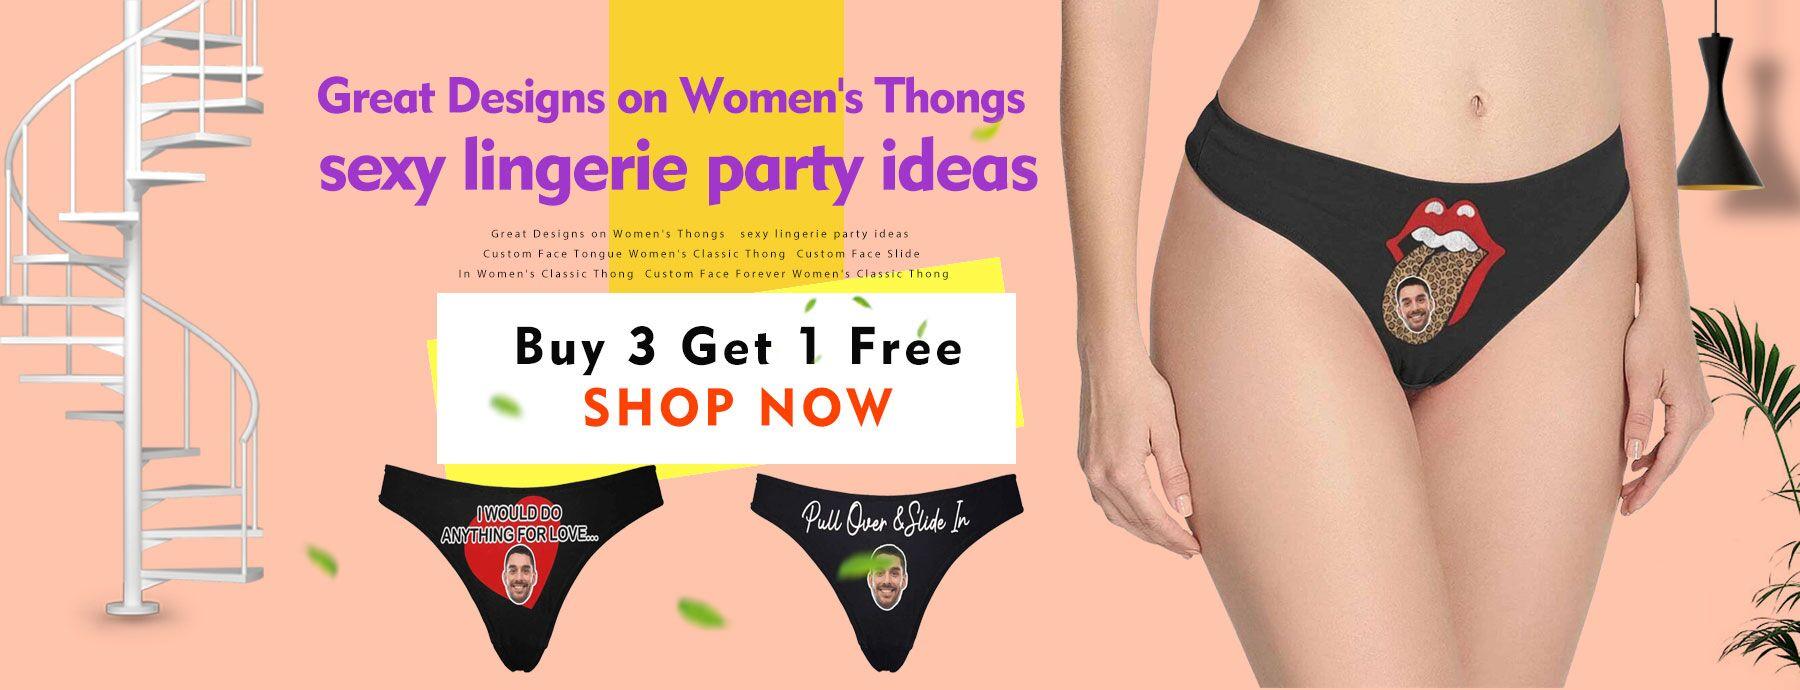 Buy 3 get 1 free- Funny Design on Women's Panties!